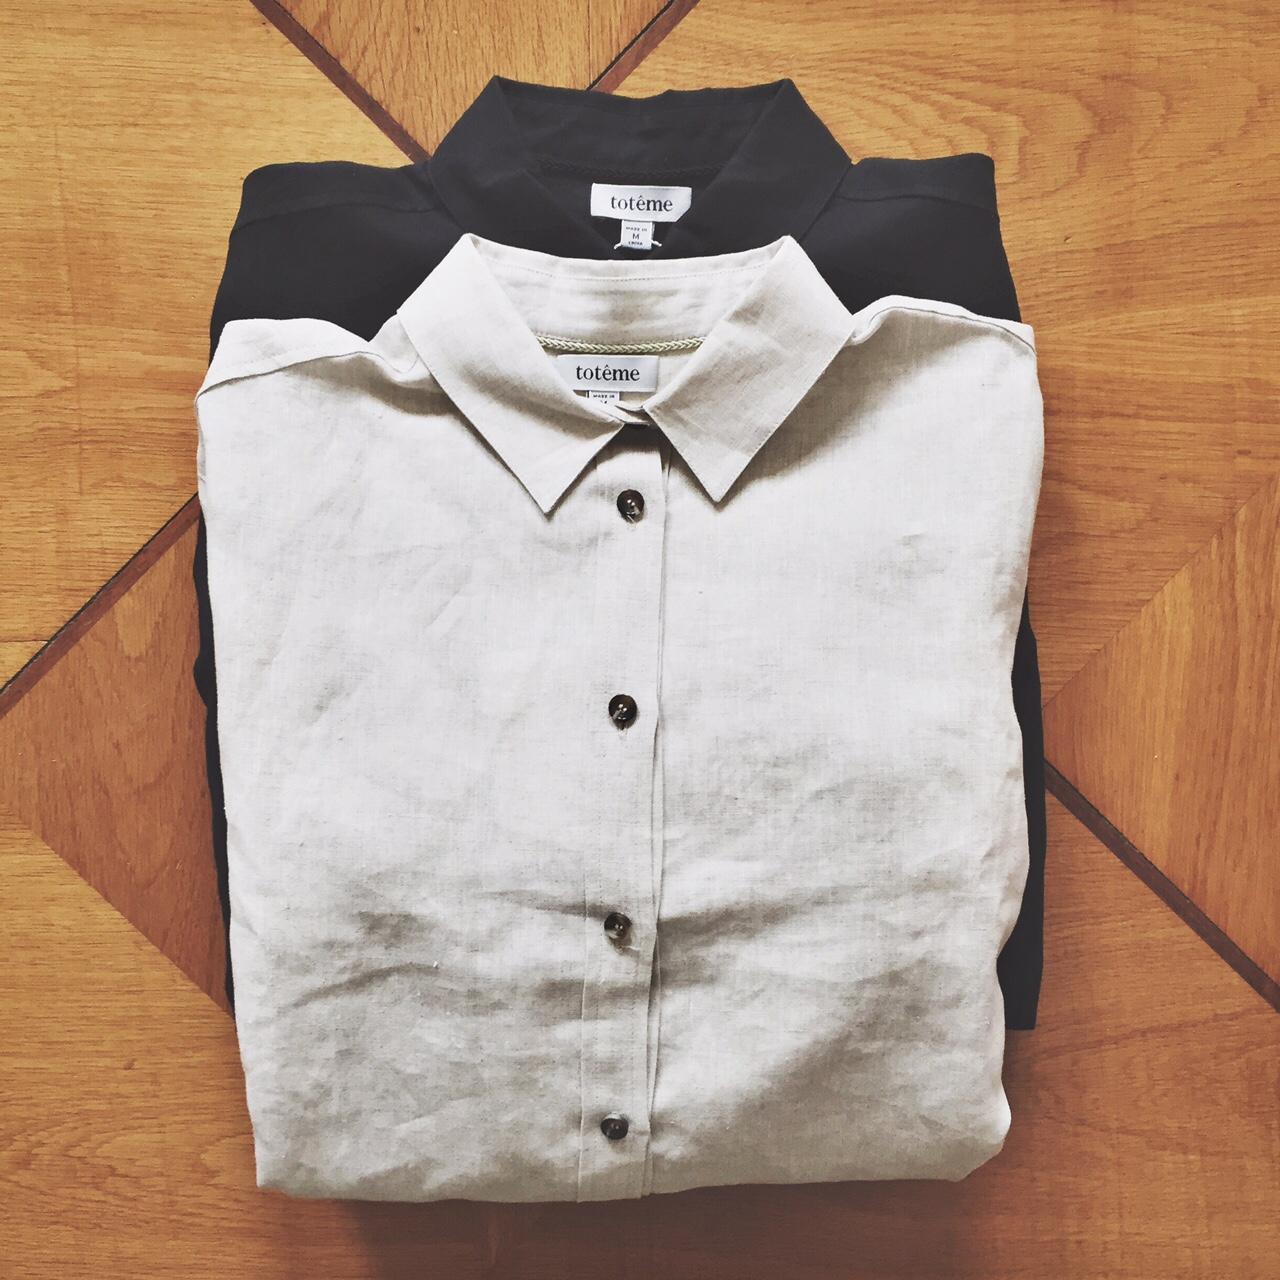 toteme_montauk_linen_shirt